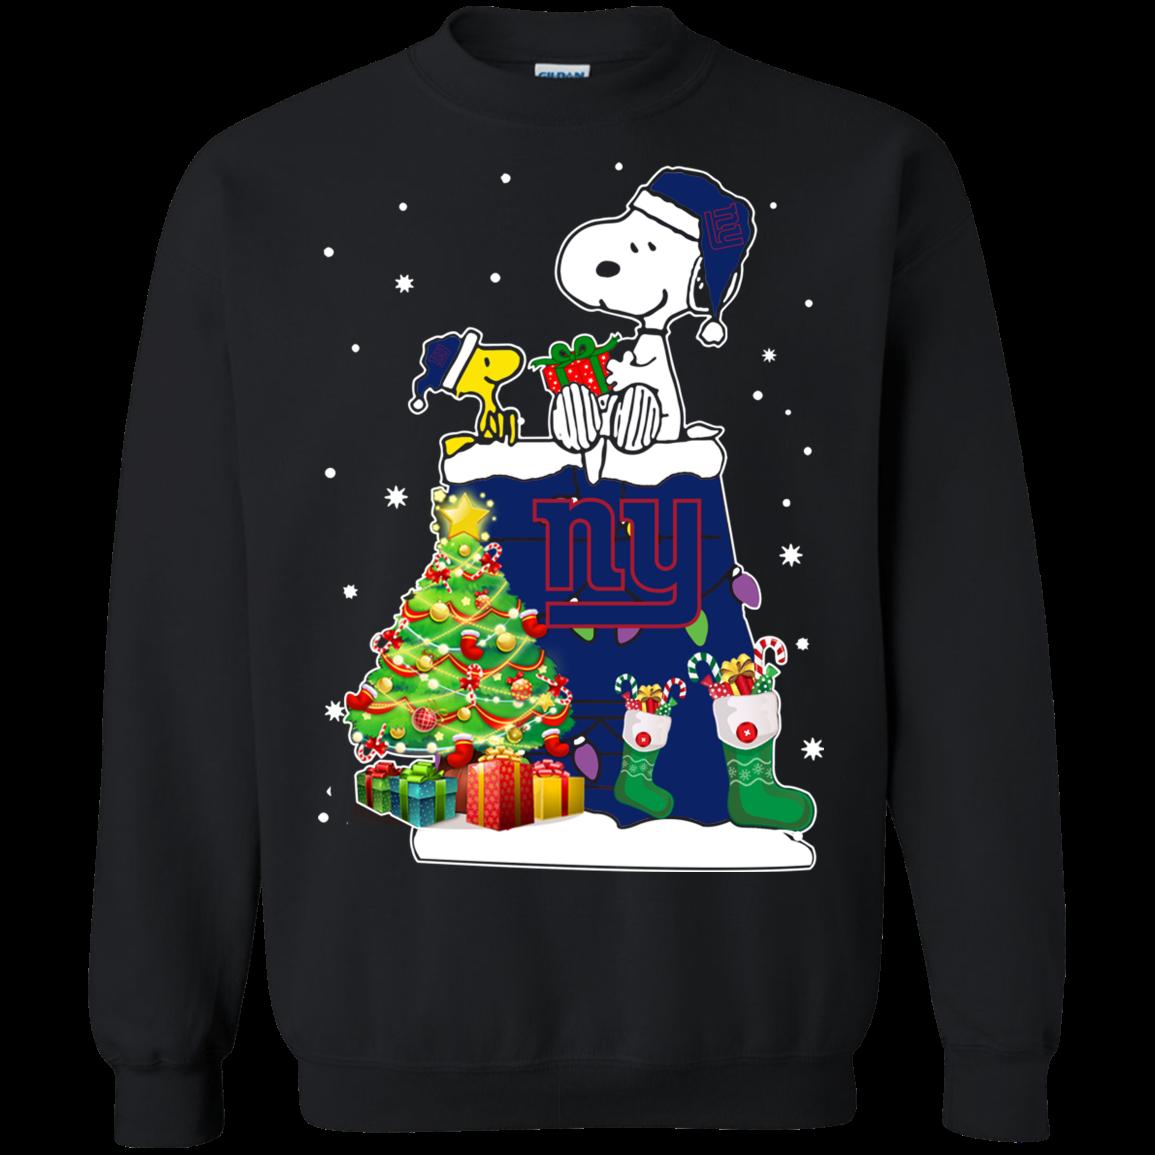 New York Giants Snoopy Woodstock Christmas Shirt